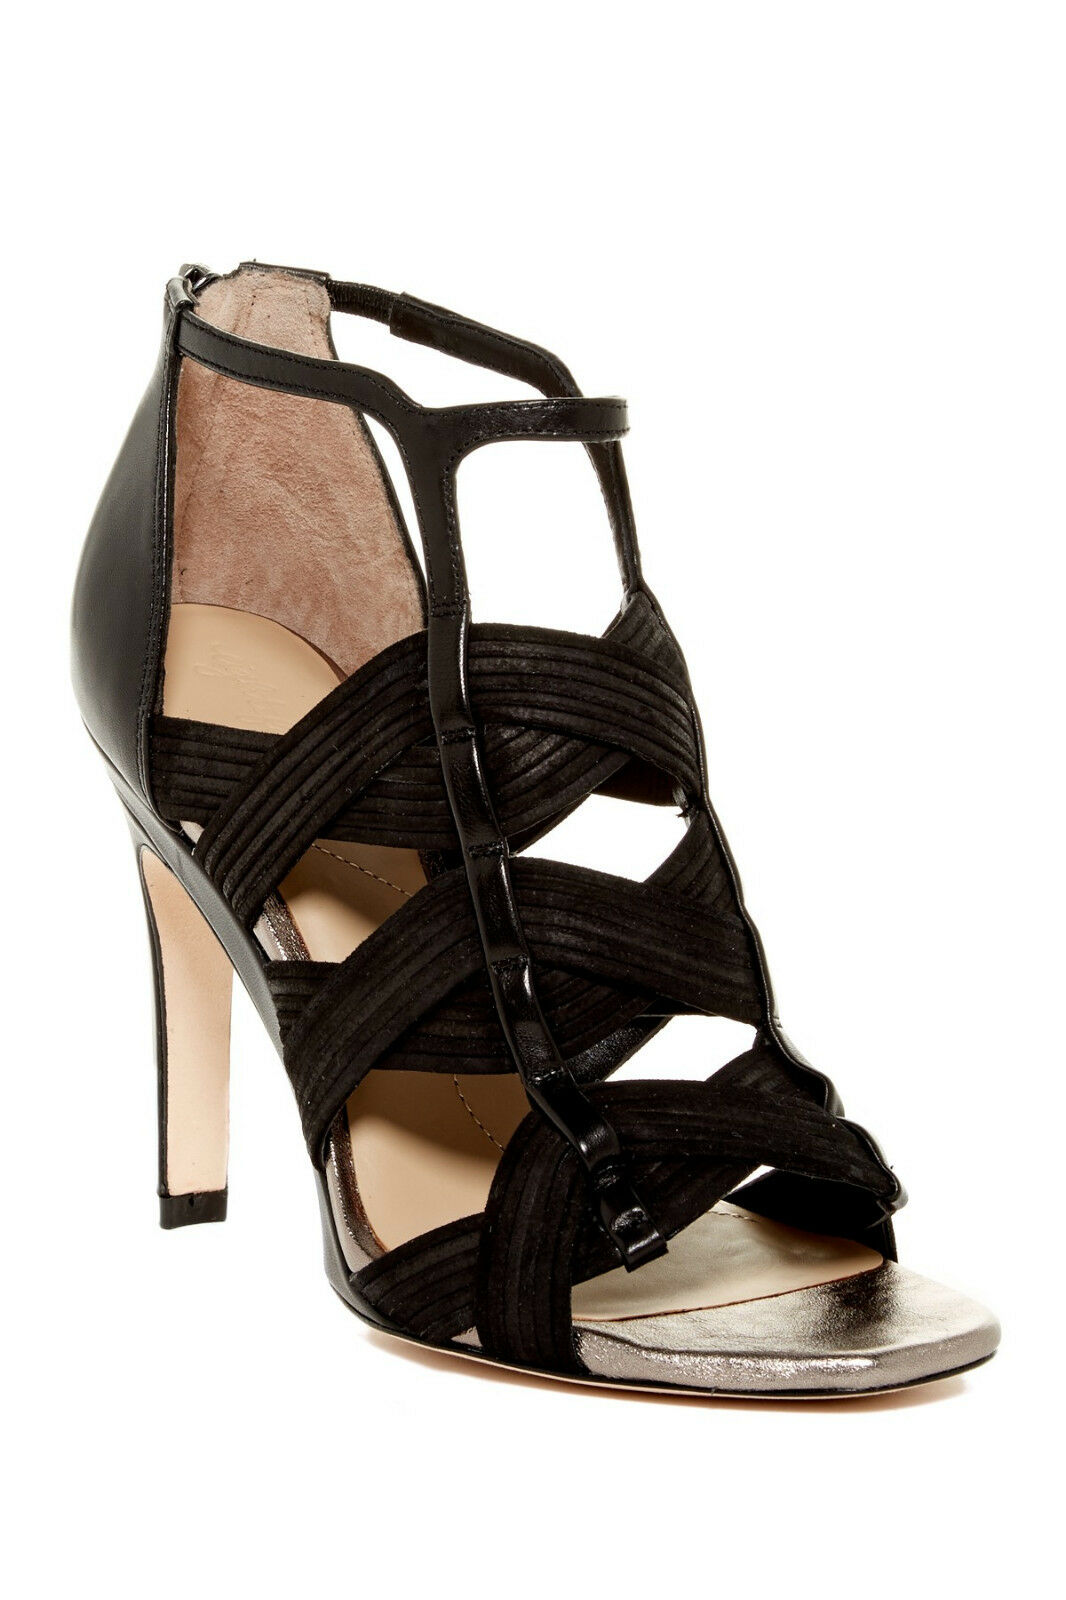 Eight fifteen Liza Cutout Sandal, Woven suede straps, Back zip, Size 9,  495 NWB